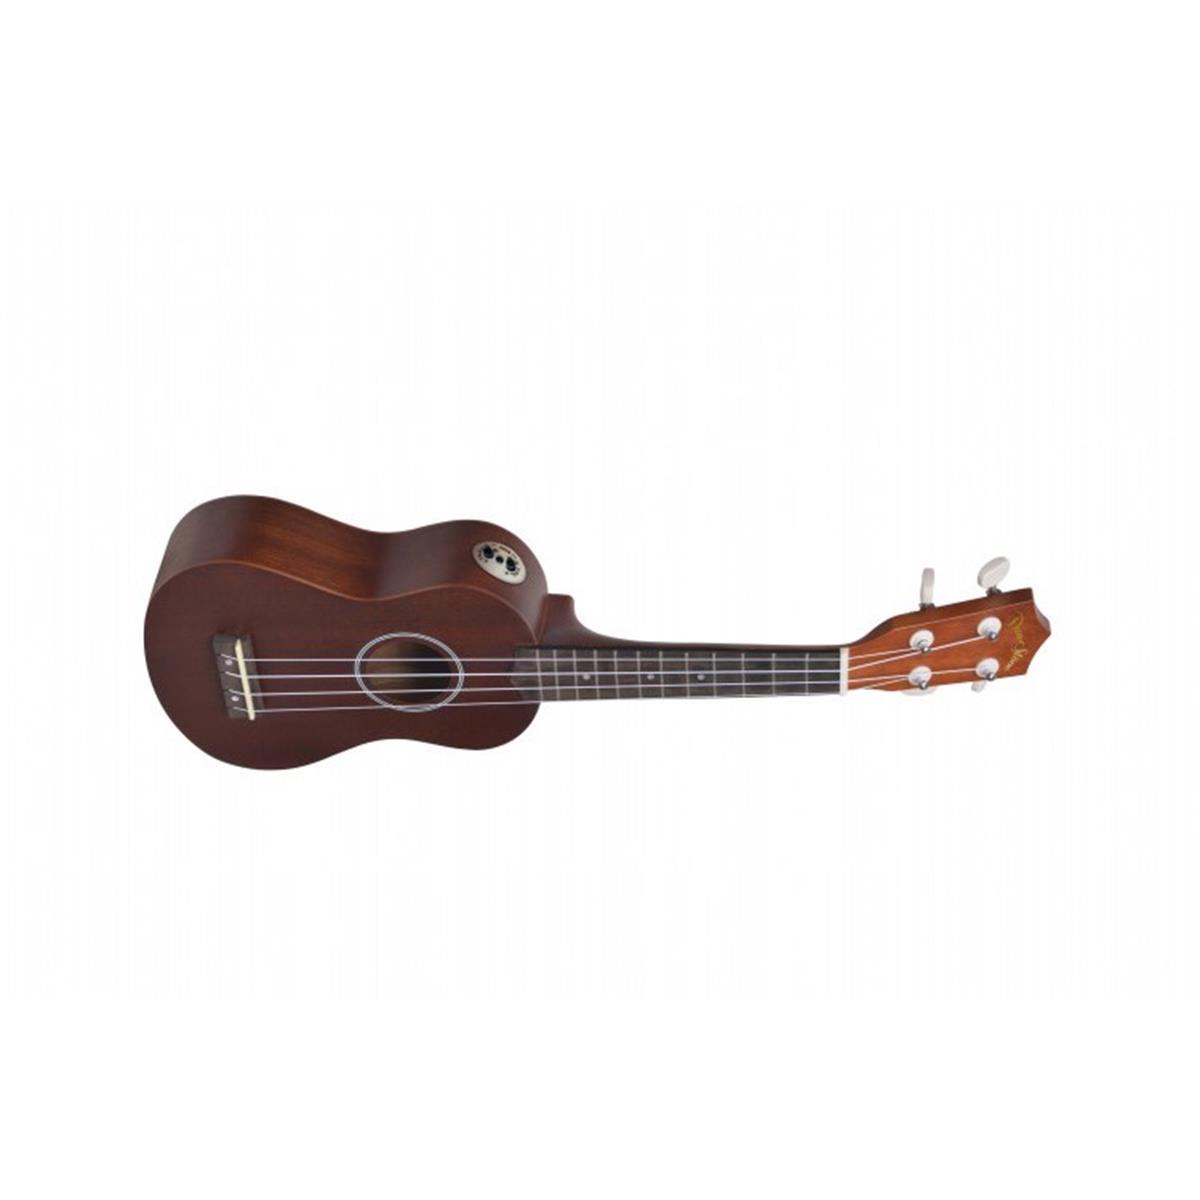 DARESTONE UKULELE SOPRANO AMPLIFICATO MOGANO - Strumenti A Corda Strumenti a Corda - Ukulele Banjo e Mandolini